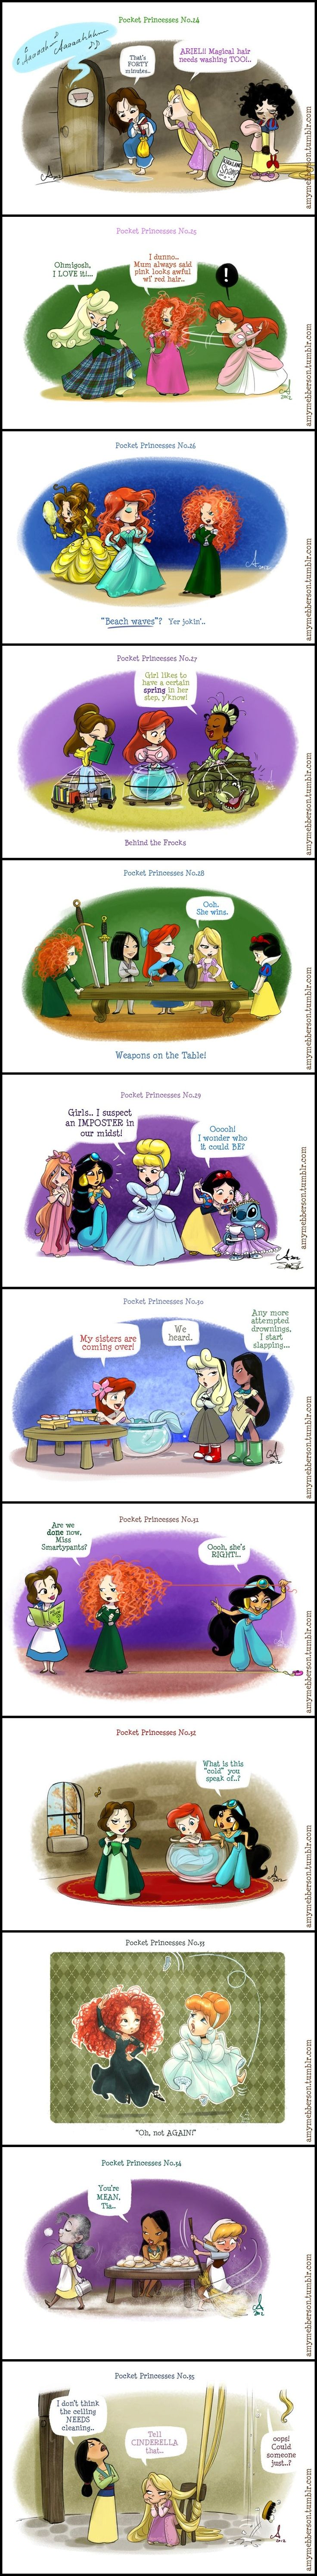 Pocket Princesses (Part 3) by Amy Mebberson